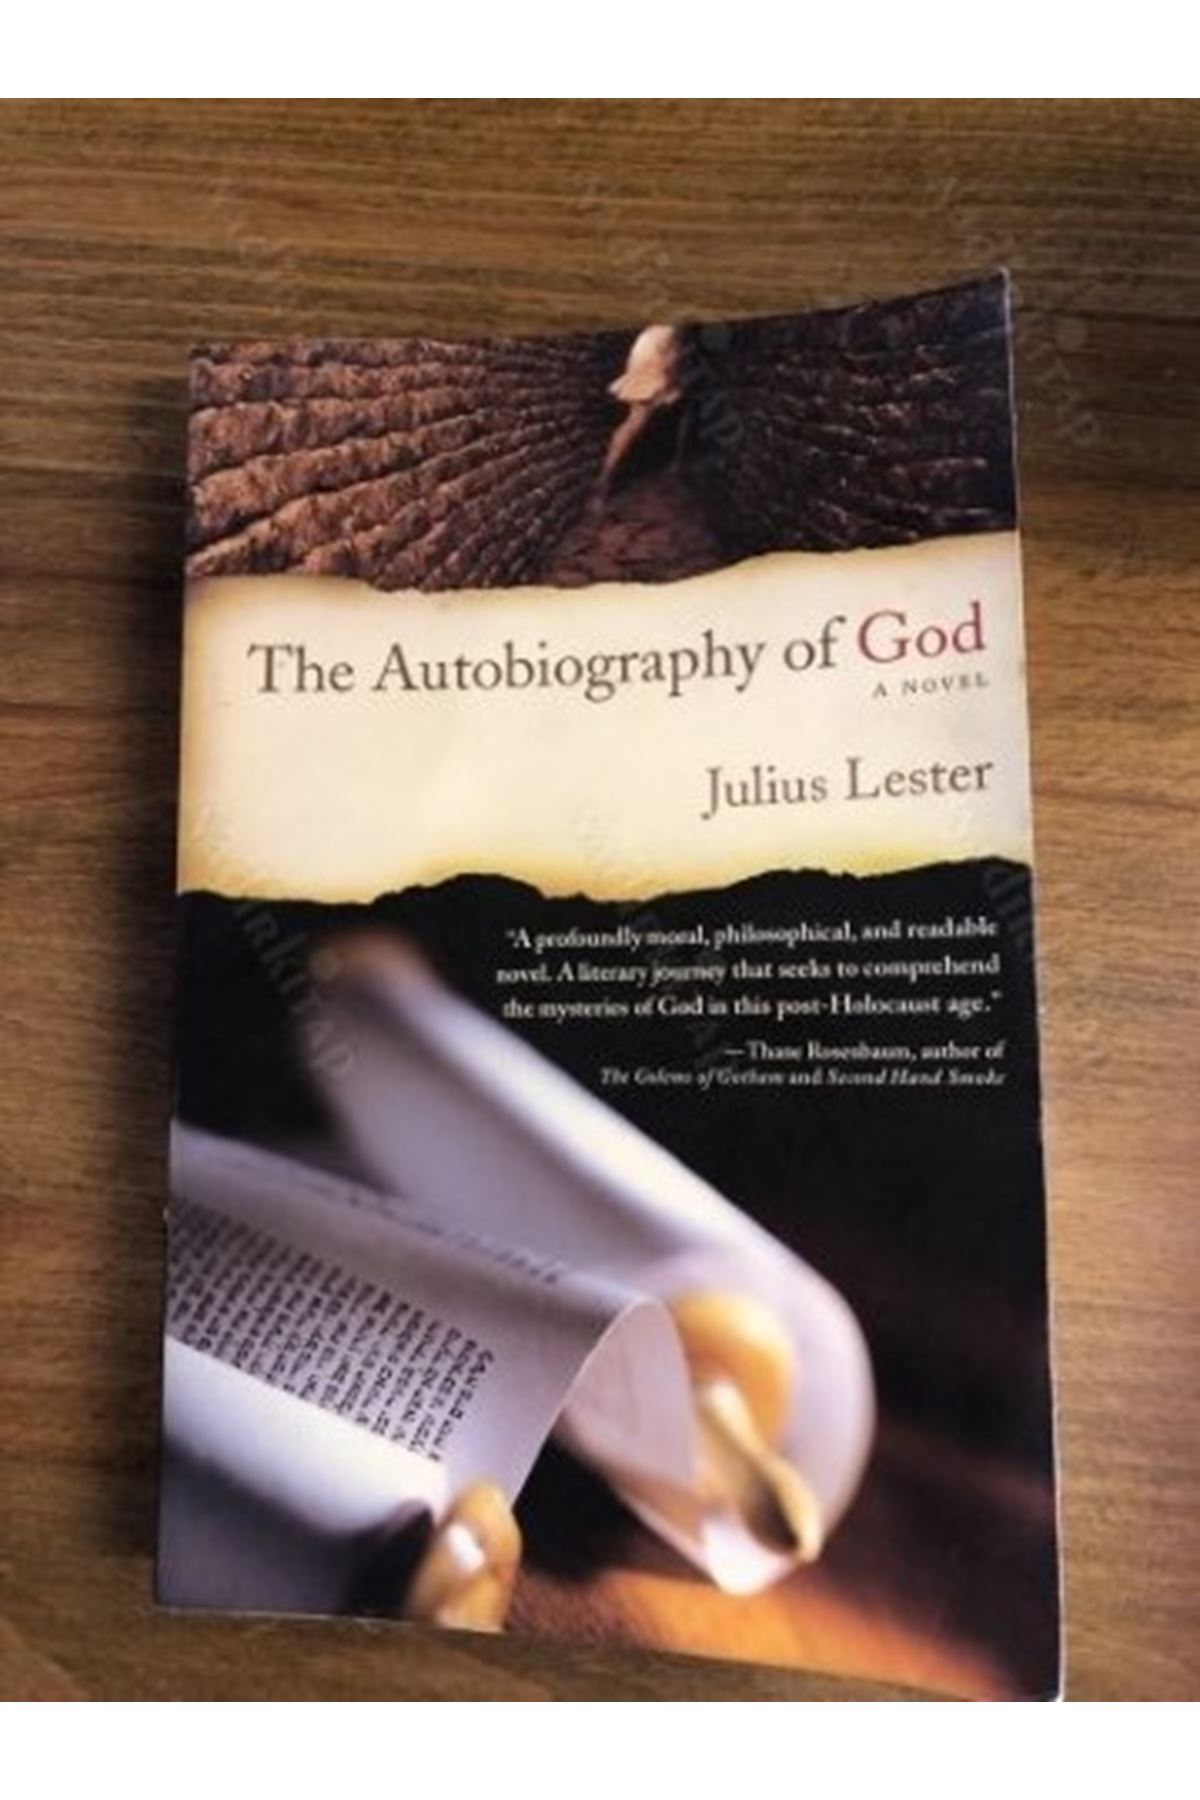 JULİUS LESTER - THE AUTOBİOGRAPHY OF GOD